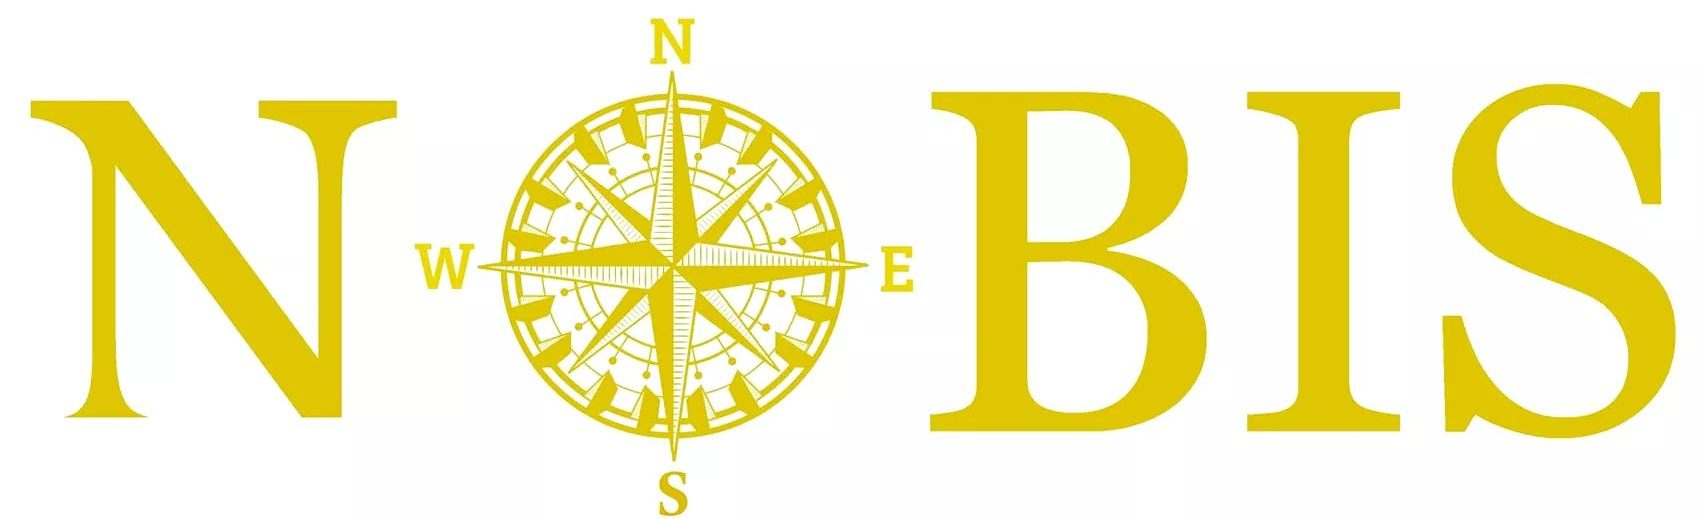 Turistička agencija Nobis | Arhiva izlet - Turistička agencija Nobis